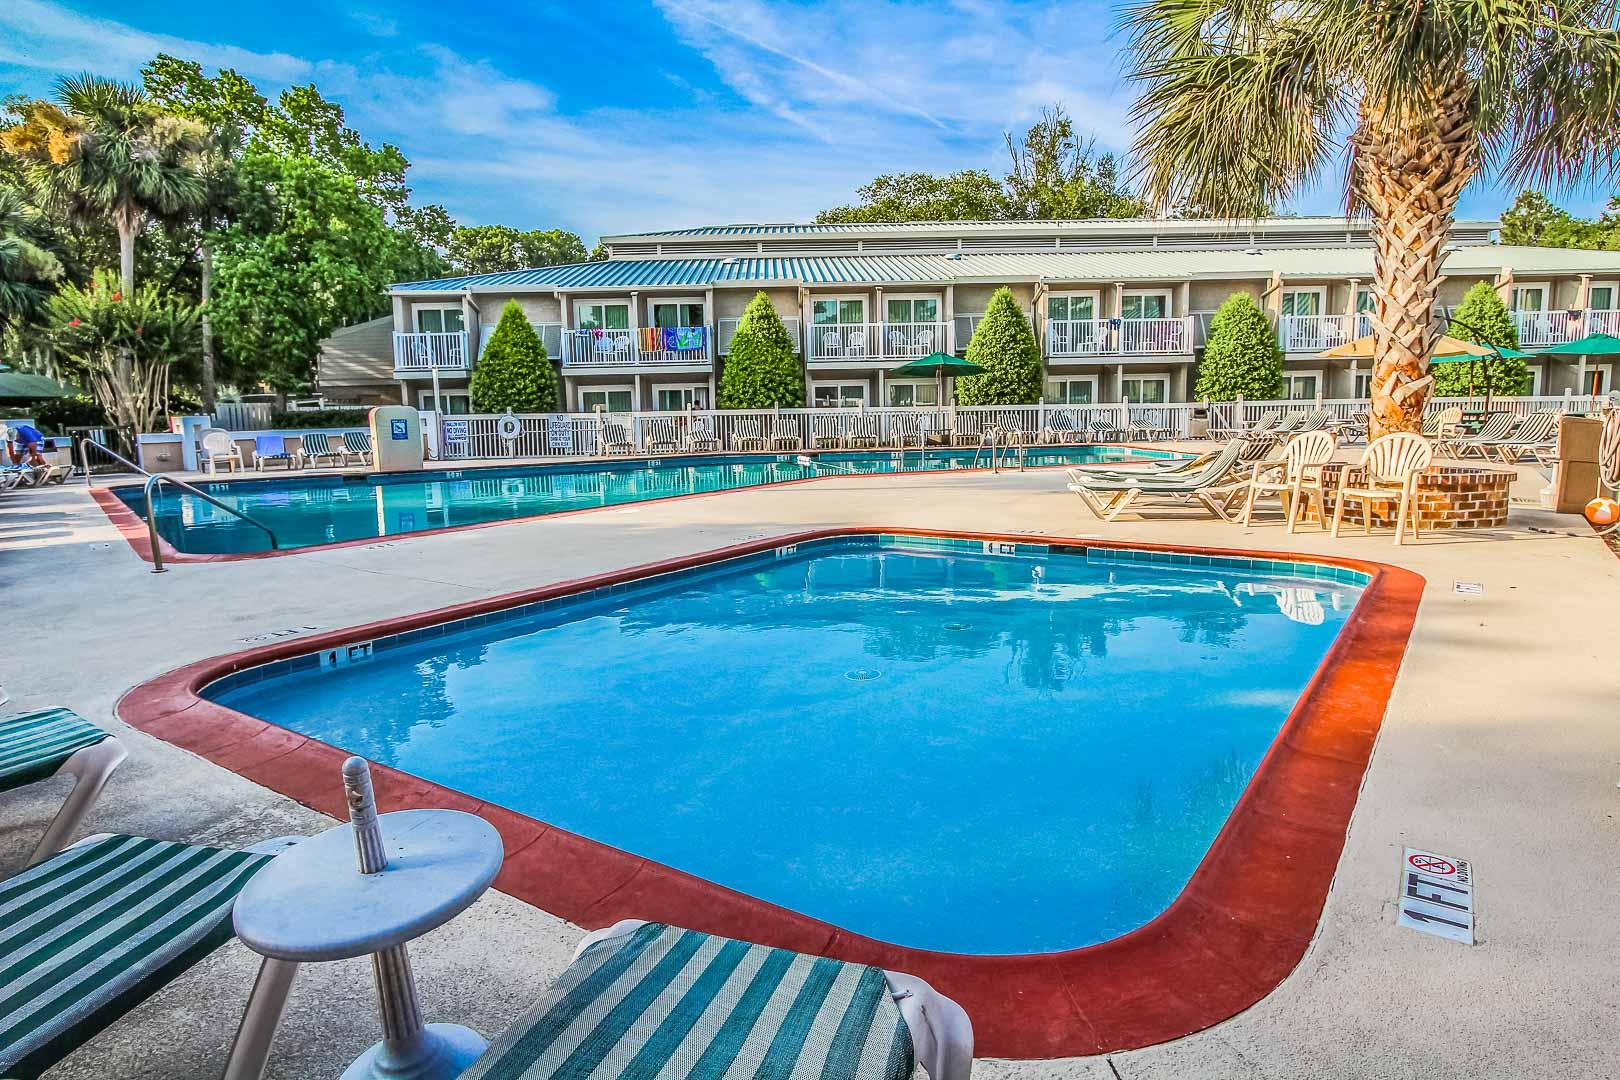 A peaceful outdoor swimming pool at VRI's Players Club Resort in Hilton Head Island, South Carolina.